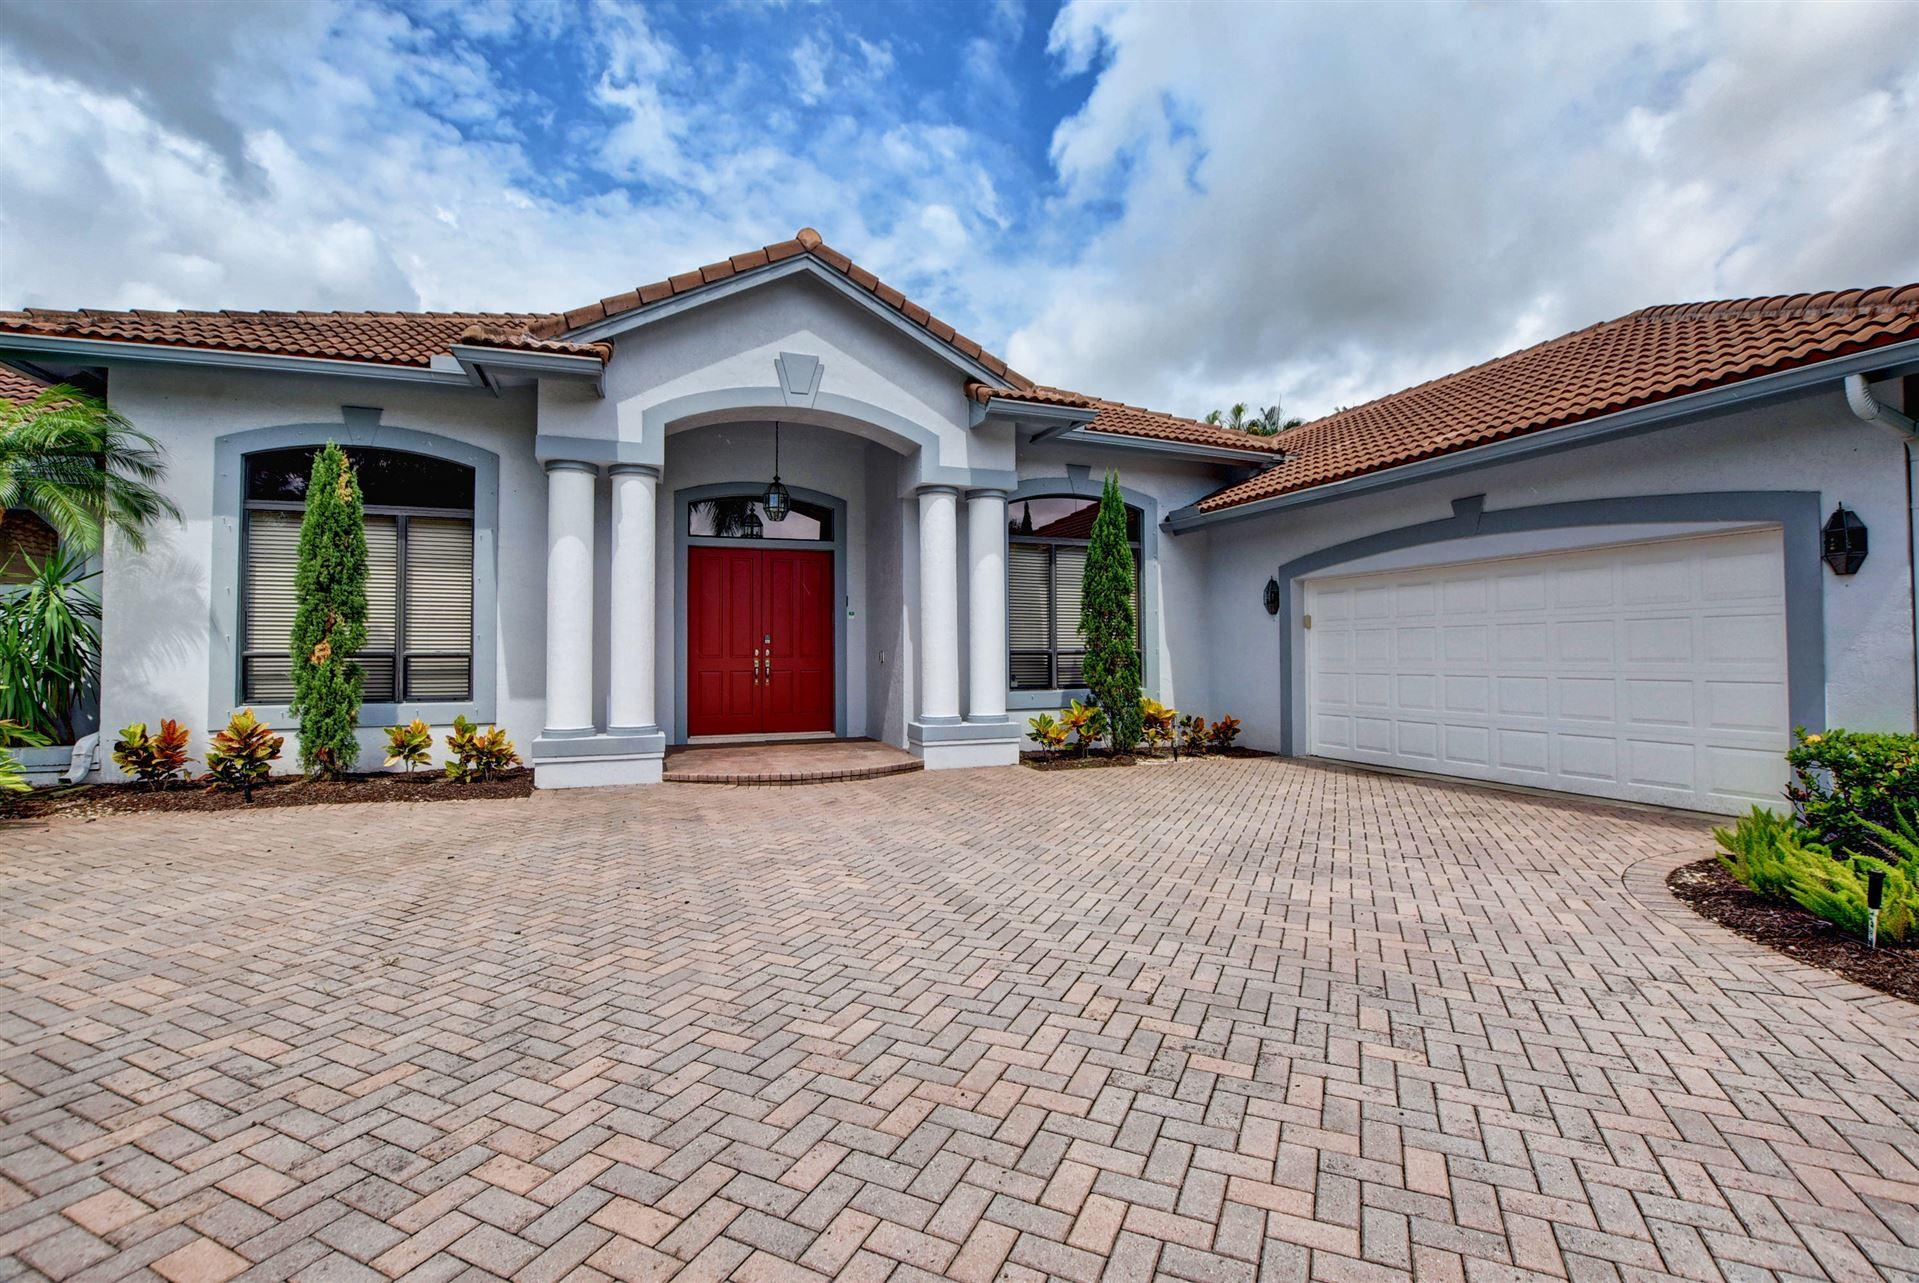 2533 Seminole Circle, West Palm Beach, FL 33409 - #: RX-10632753